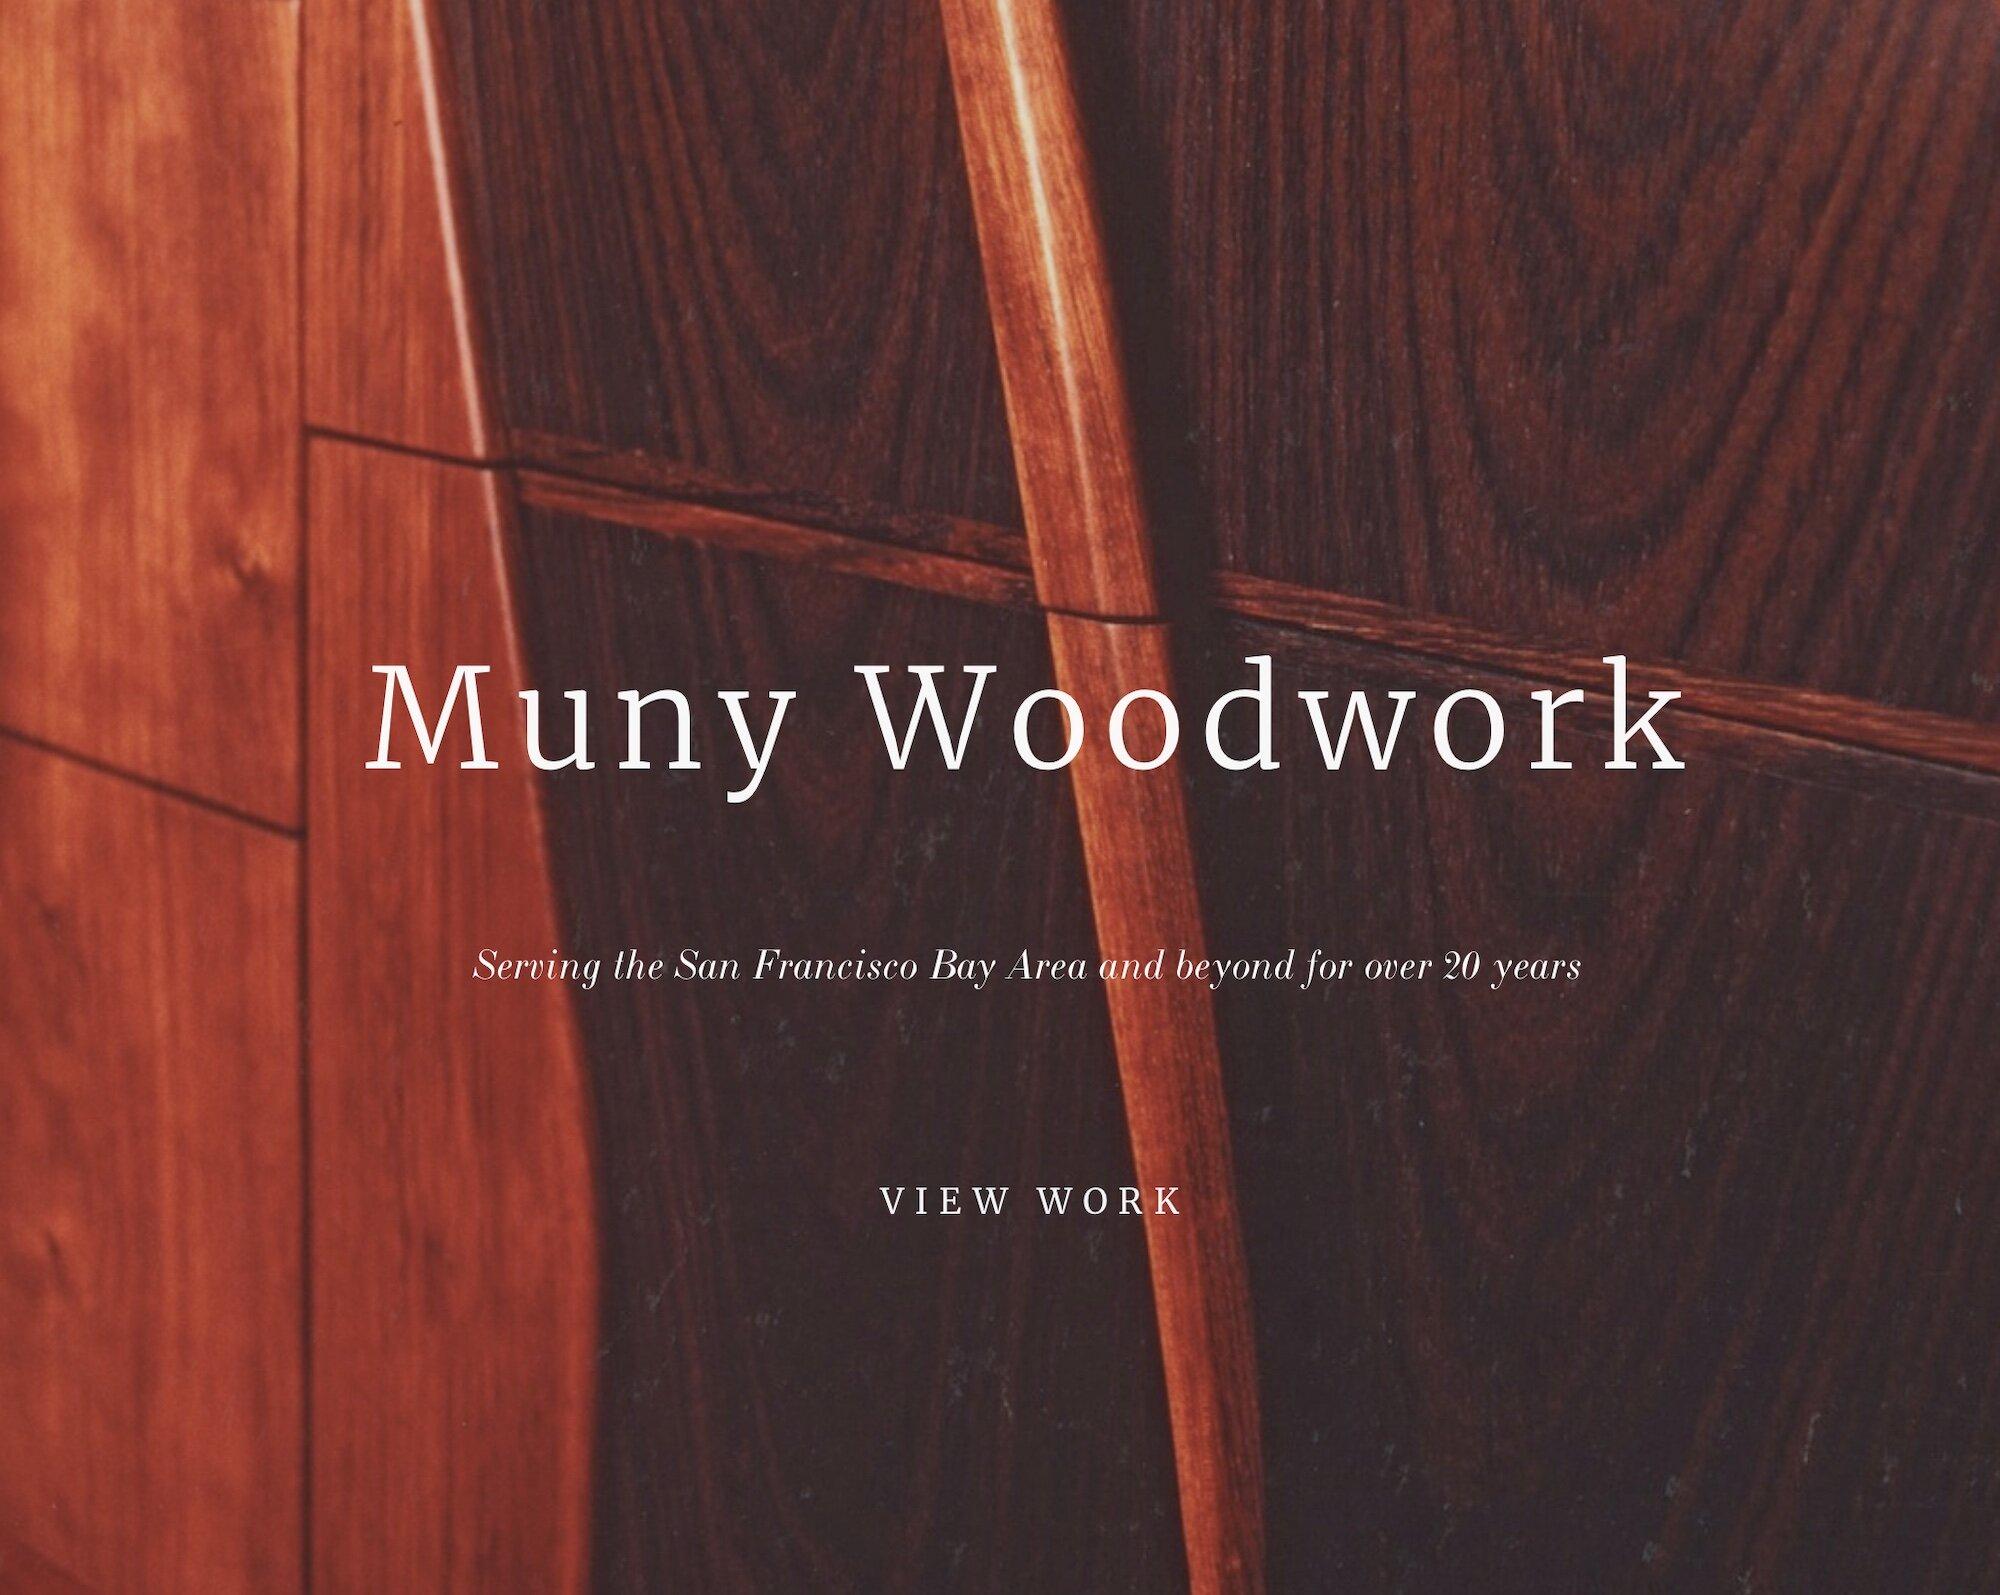 Munywoodwork.jpg